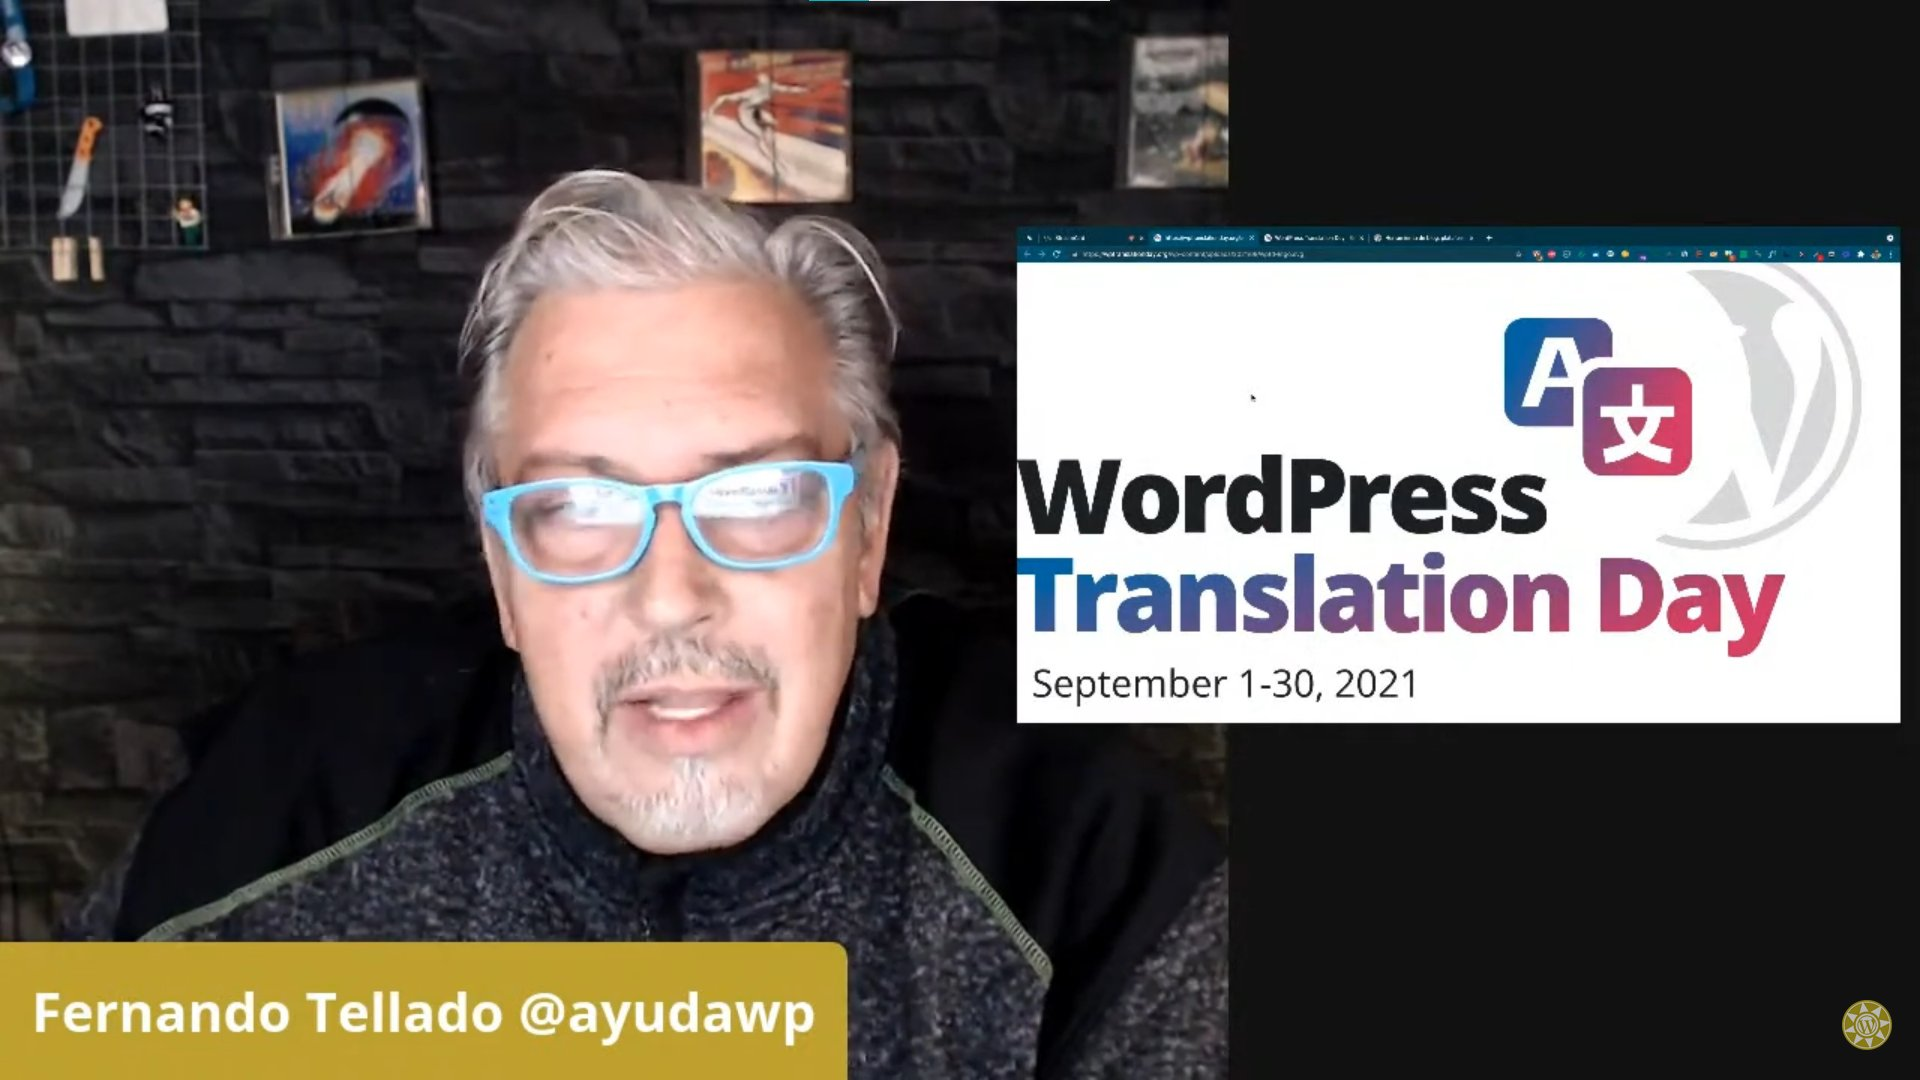 [Blog] Meetup sobre el WordPress Translation Day por Fernando Tellado